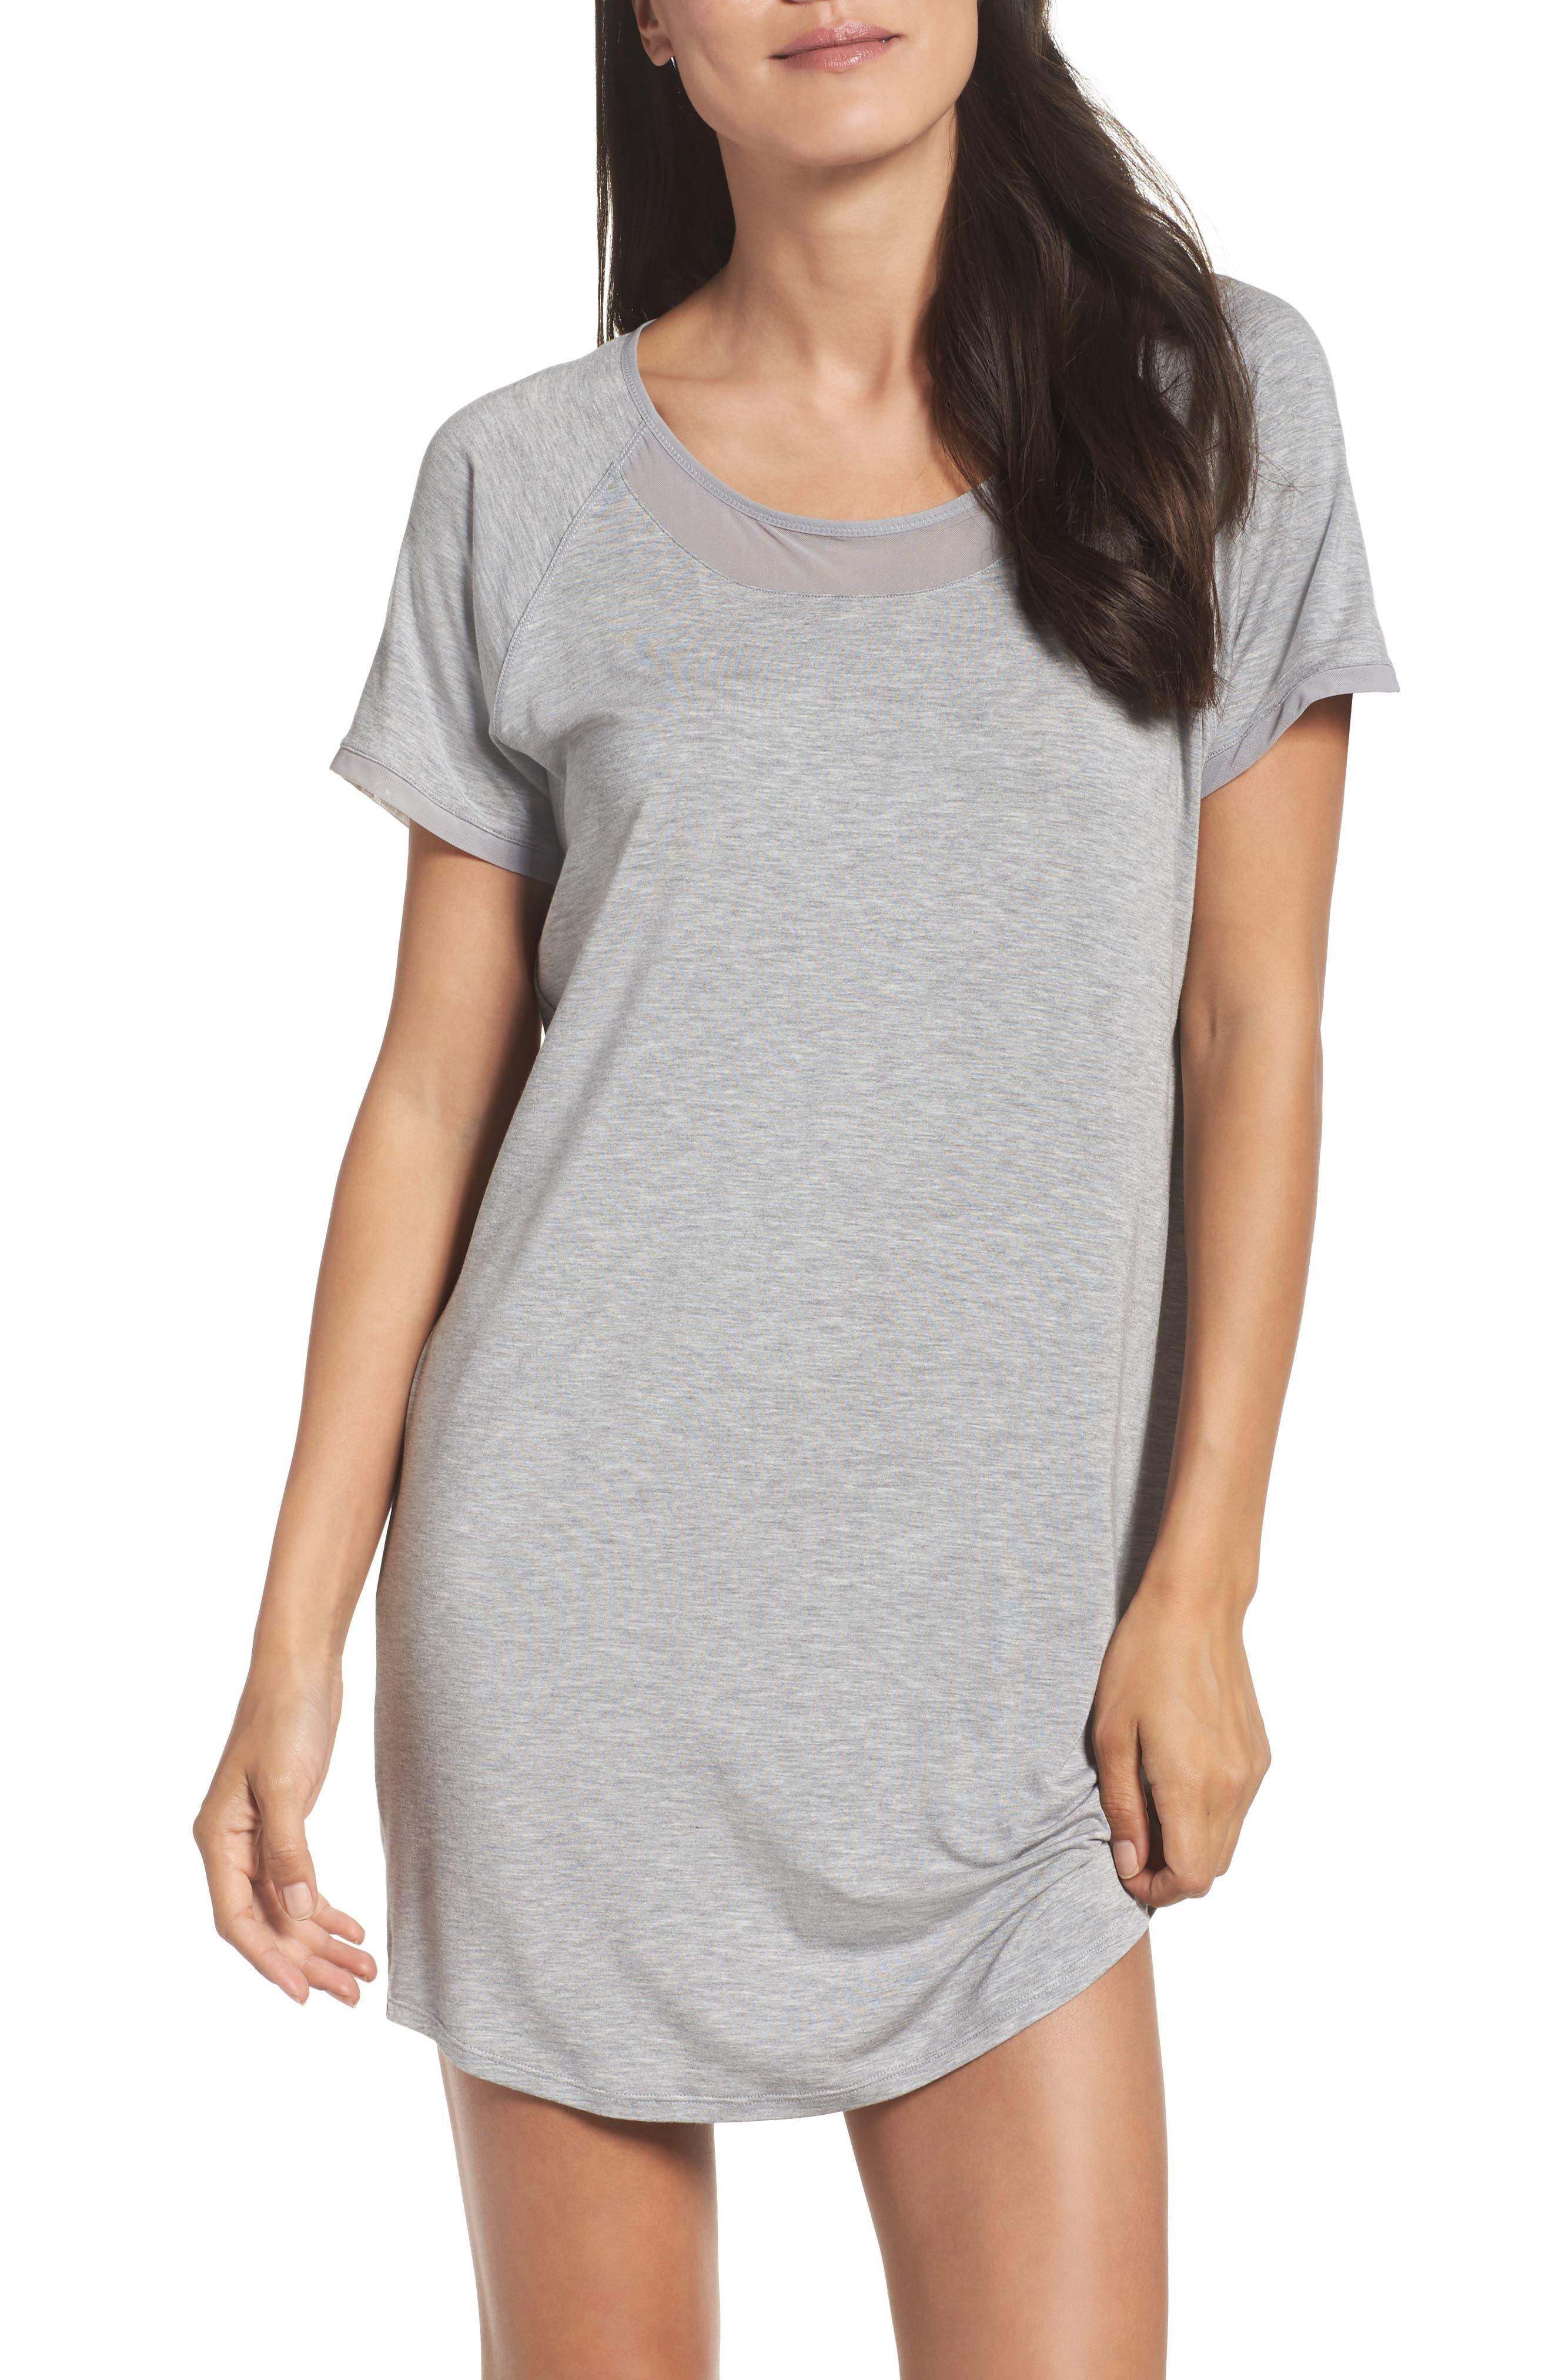 Sleep Shirt,                             Main thumbnail 1, color,                             Light Grey Heather